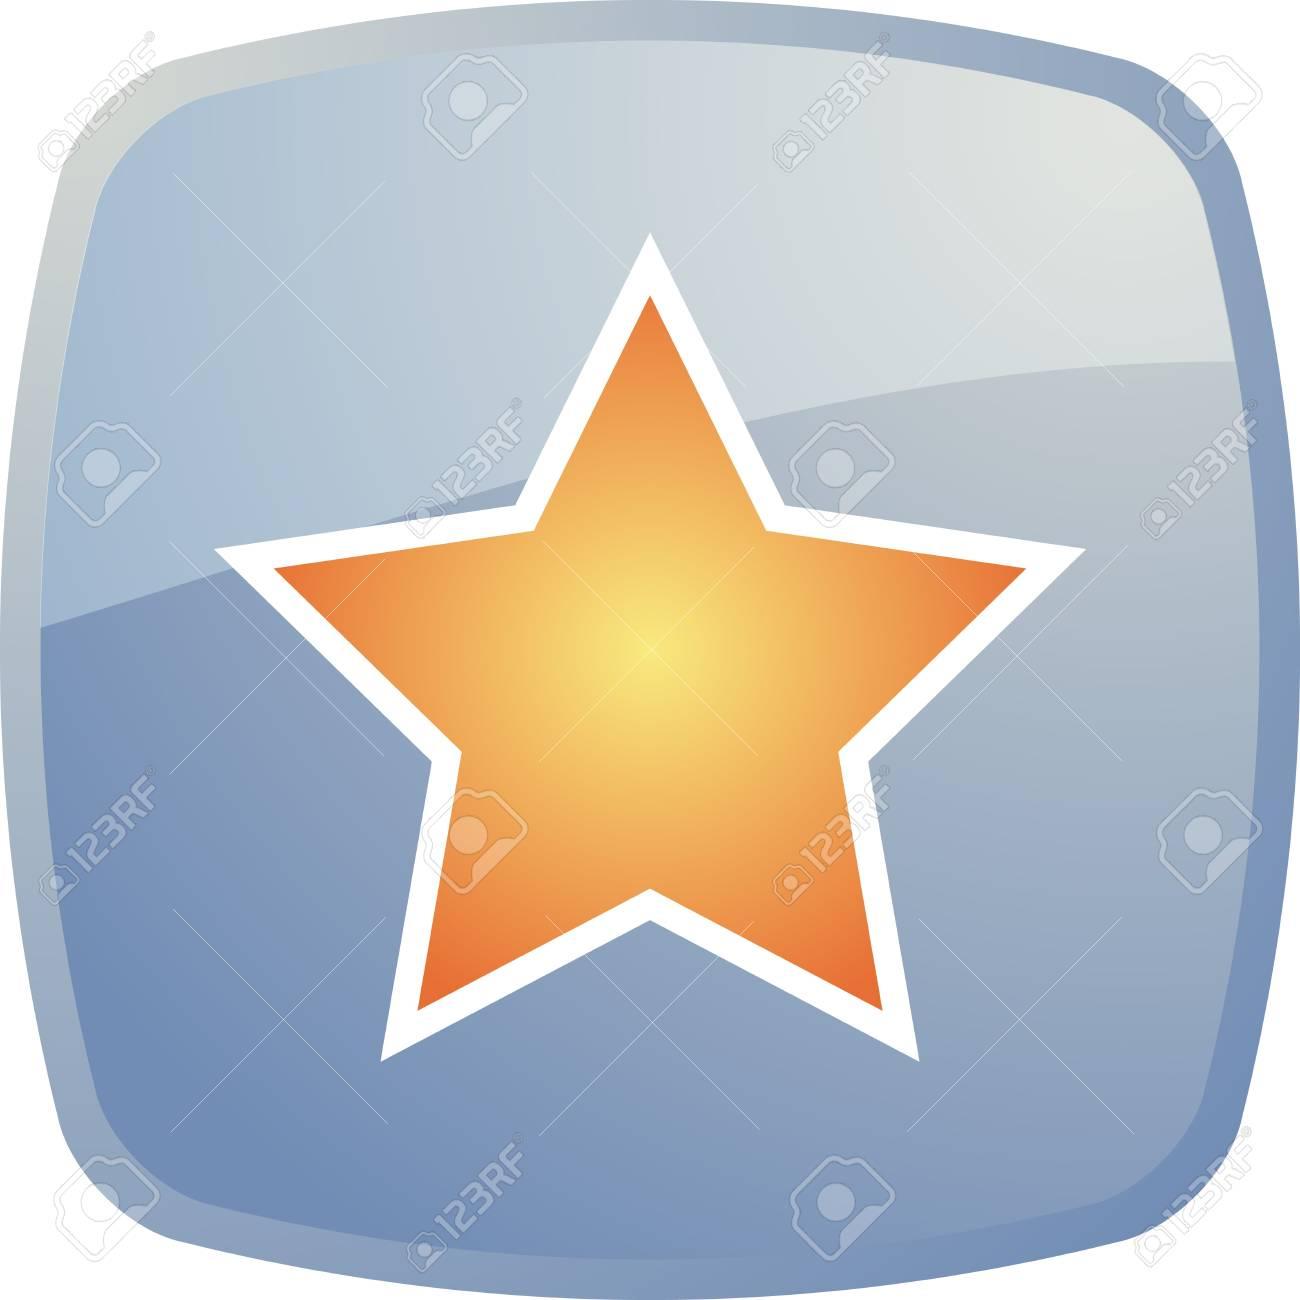 Bookmark navigation icon glossy button, square shape Stock Photo - 4522959